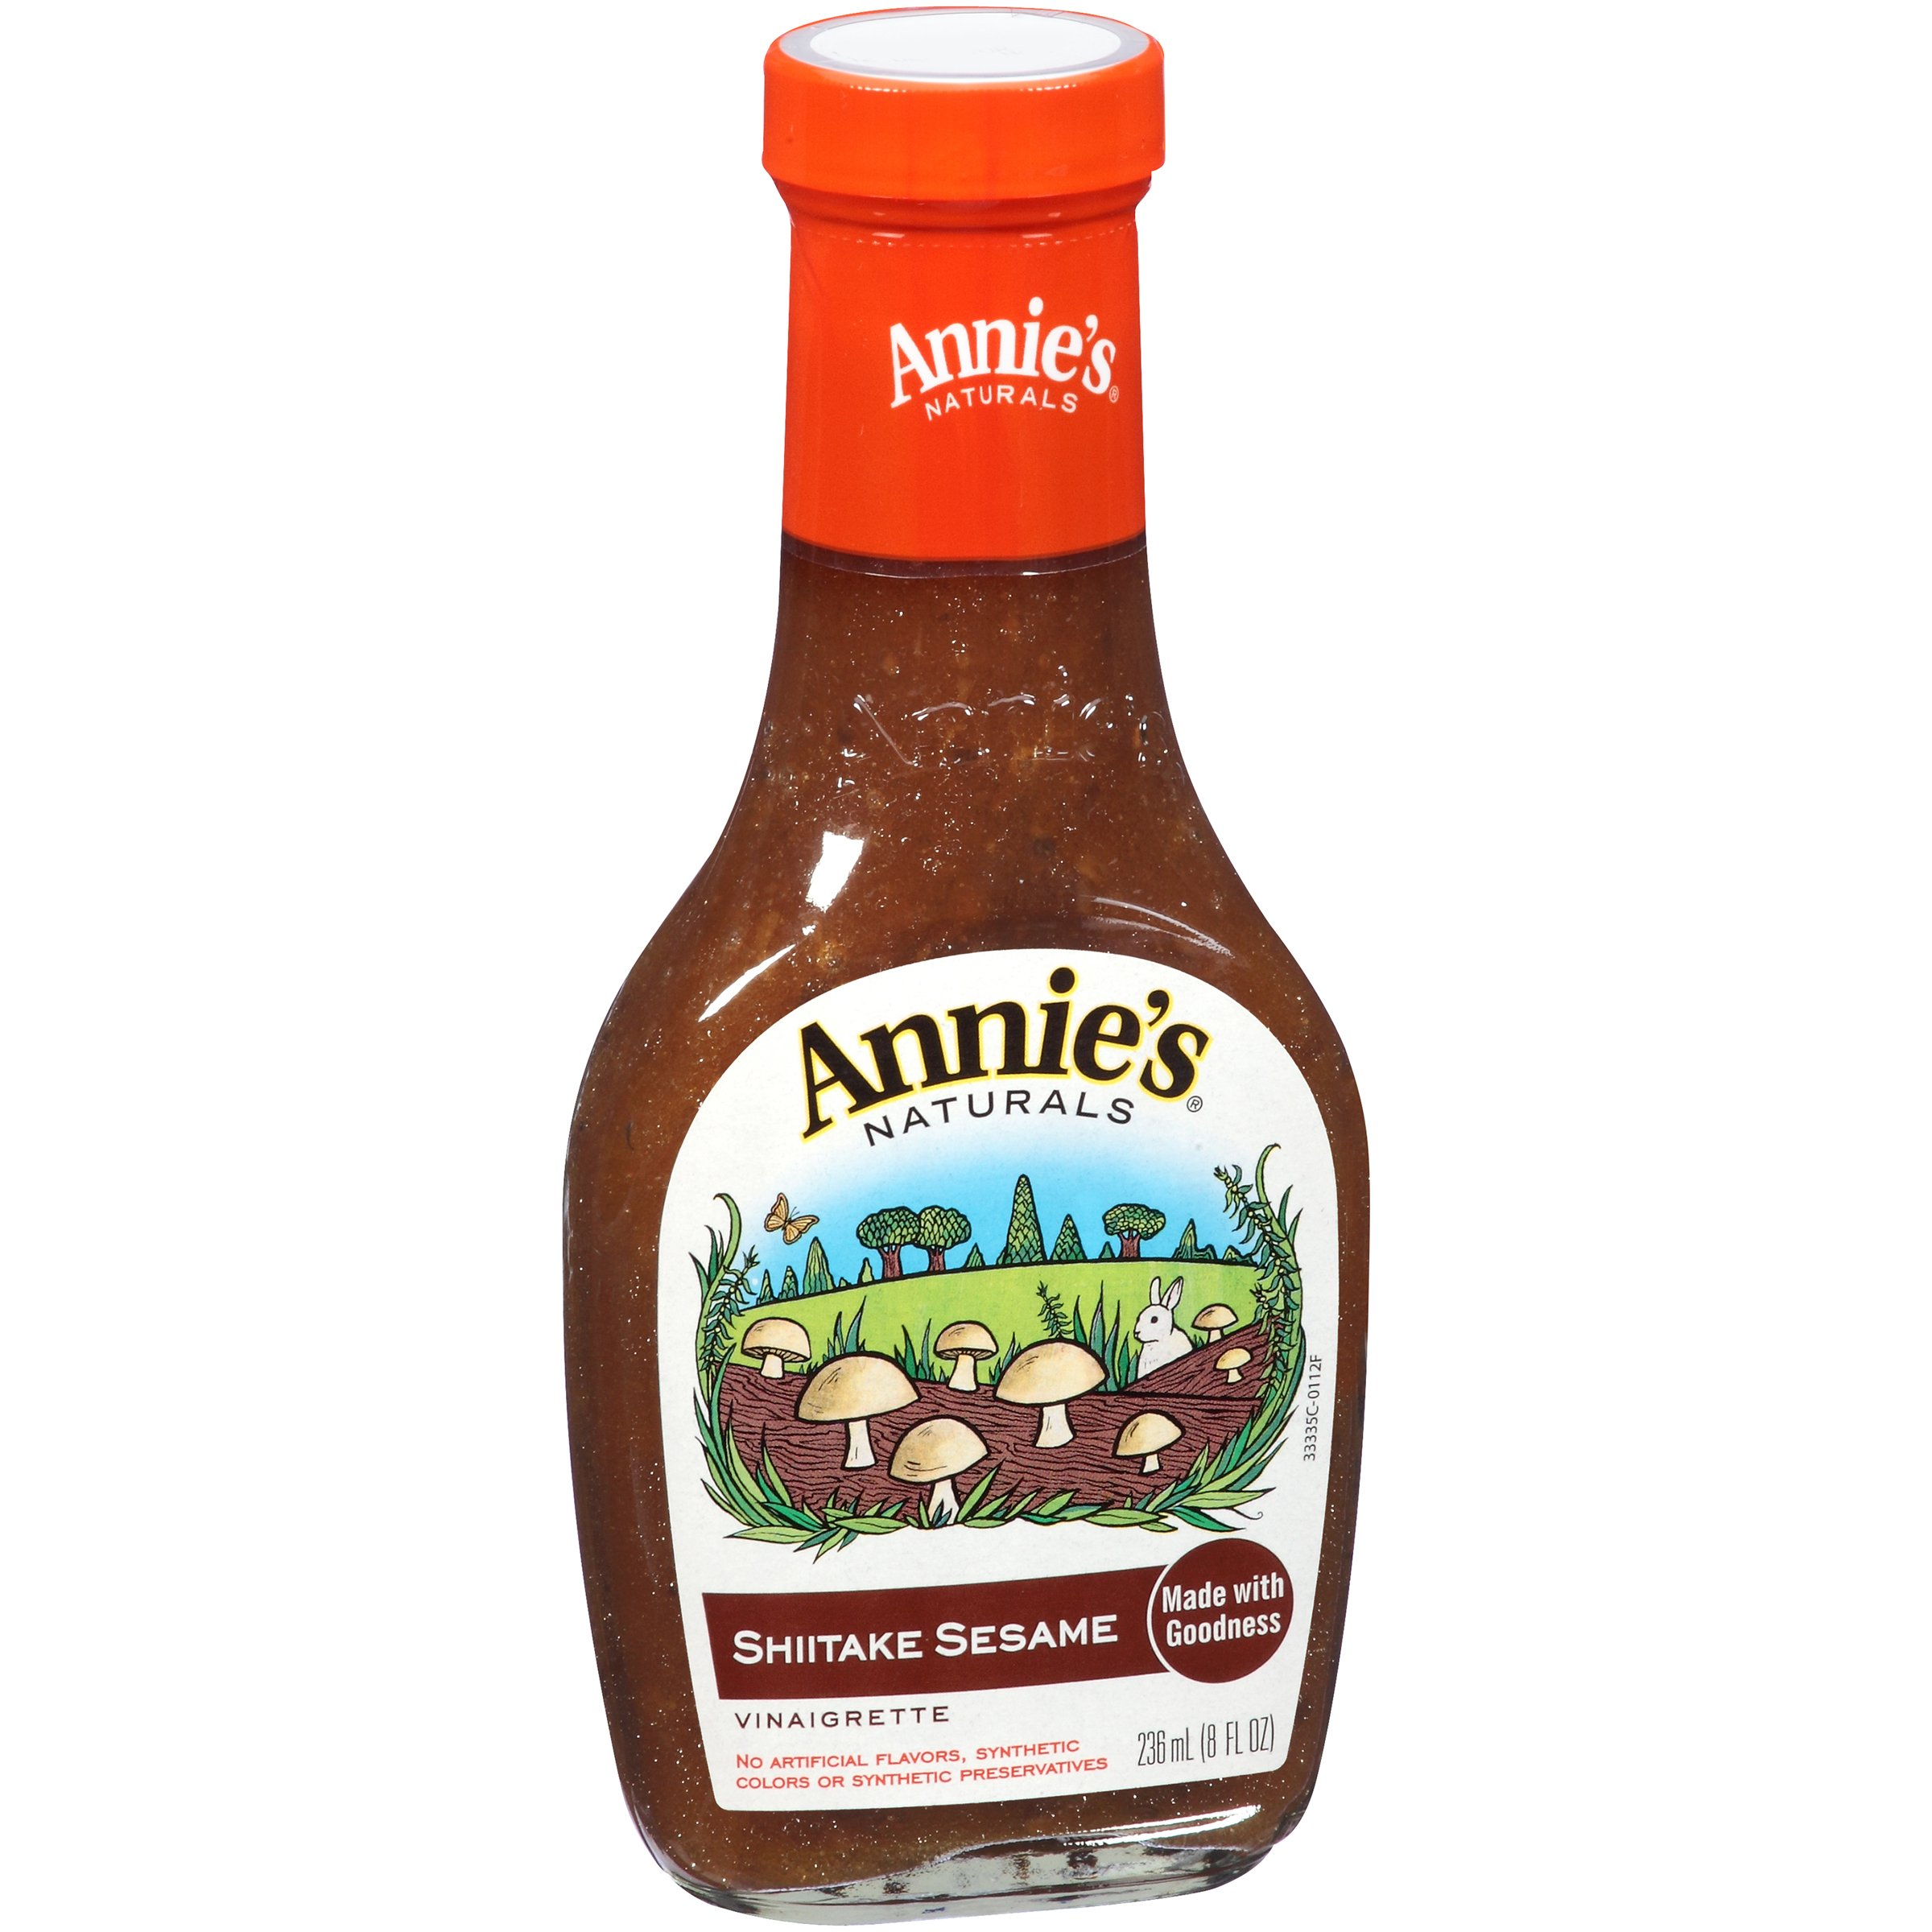 Annie's Natural Shiitake Sesame Dressing 8 fl oz Bottle